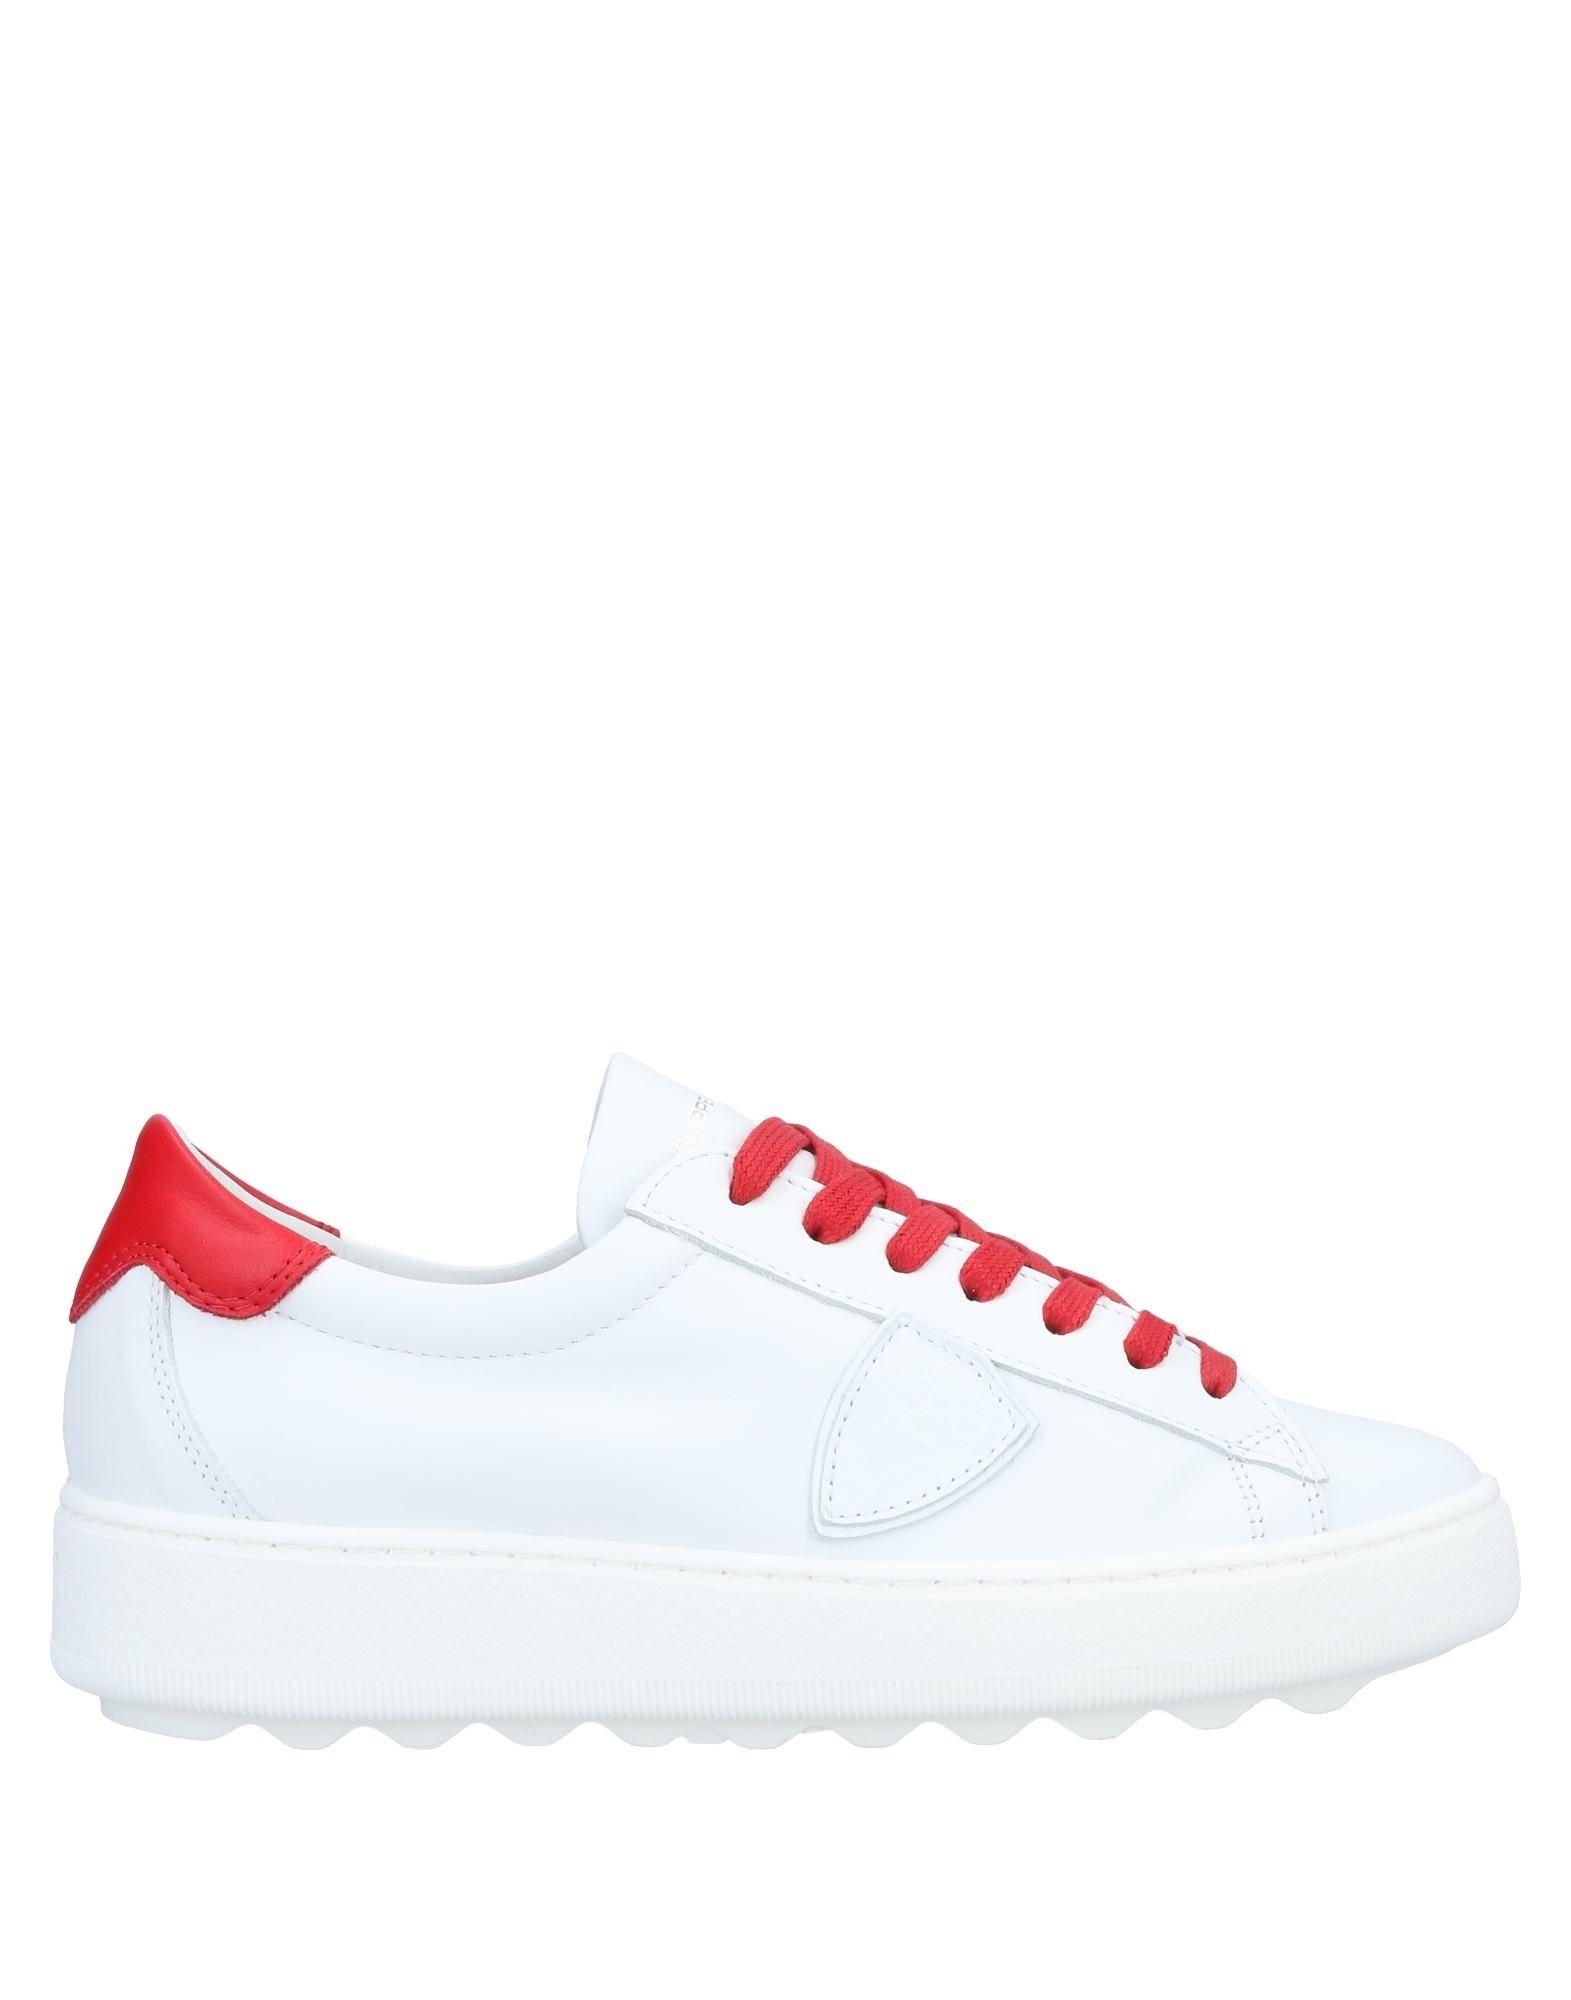 Philippe Model Damen Sneakers Damen Model Gutes Preis-Leistungs-Verhältnis, es lohnt sich 87db1d